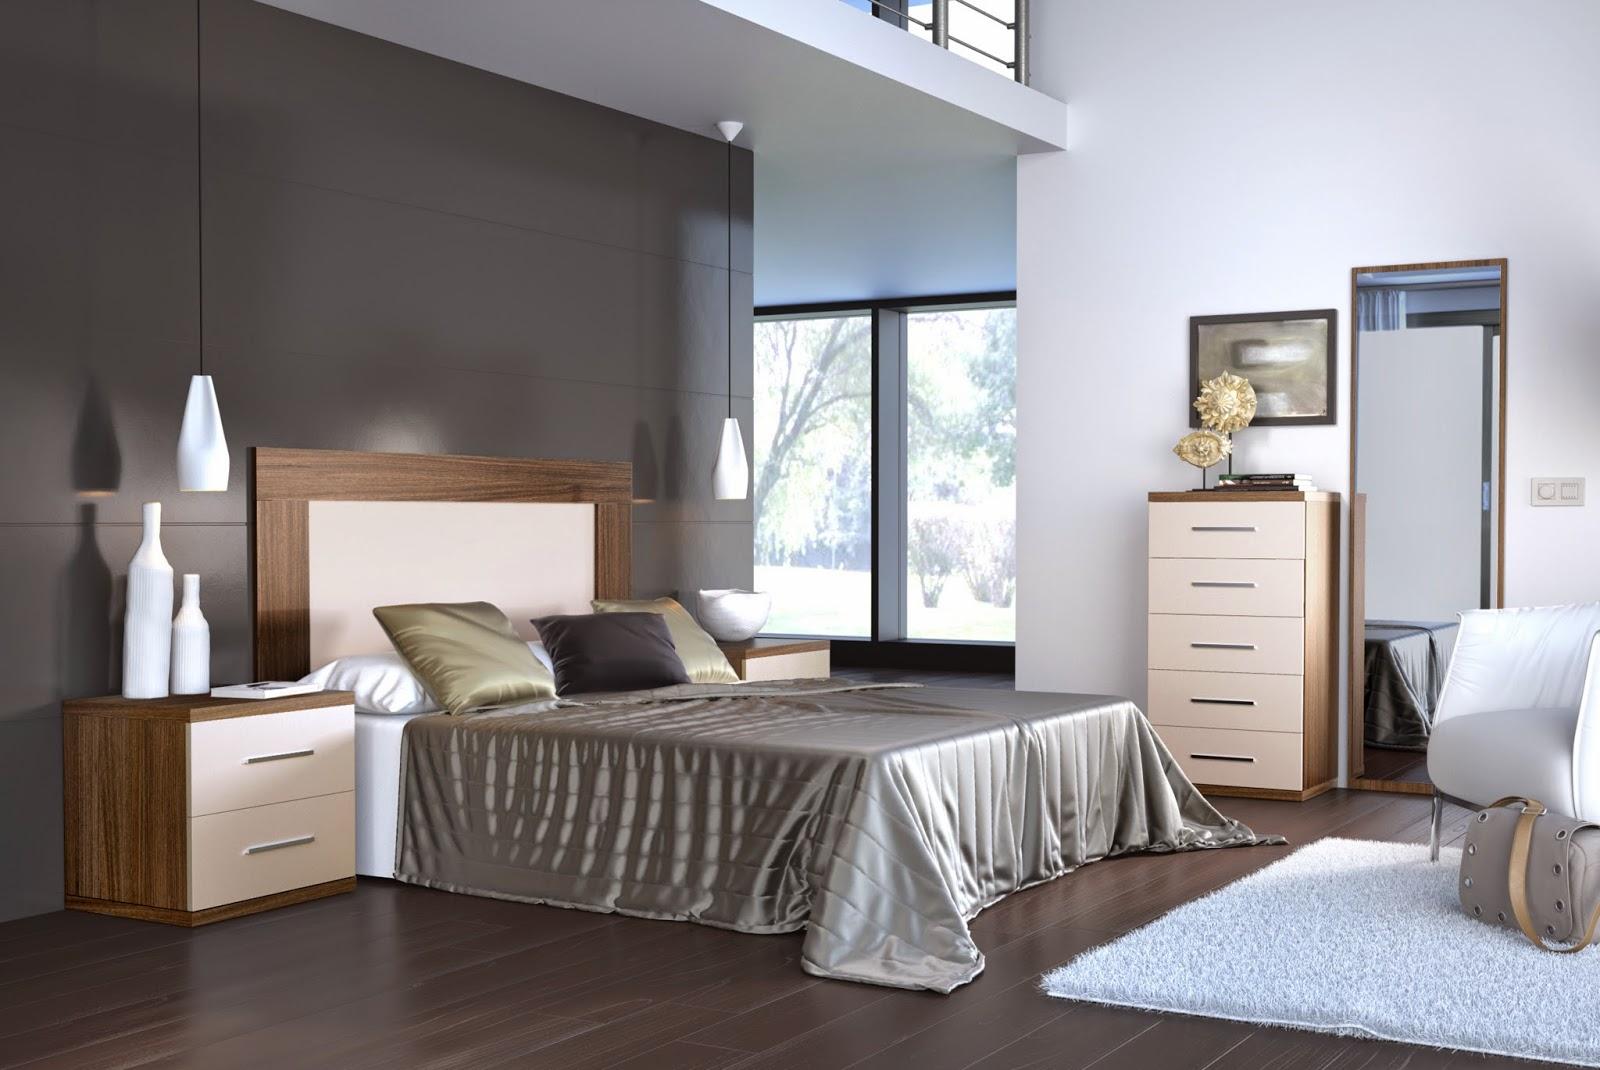 Tu tienda ahorro dormitorio de matrimonio for Dormitorios ahorro total